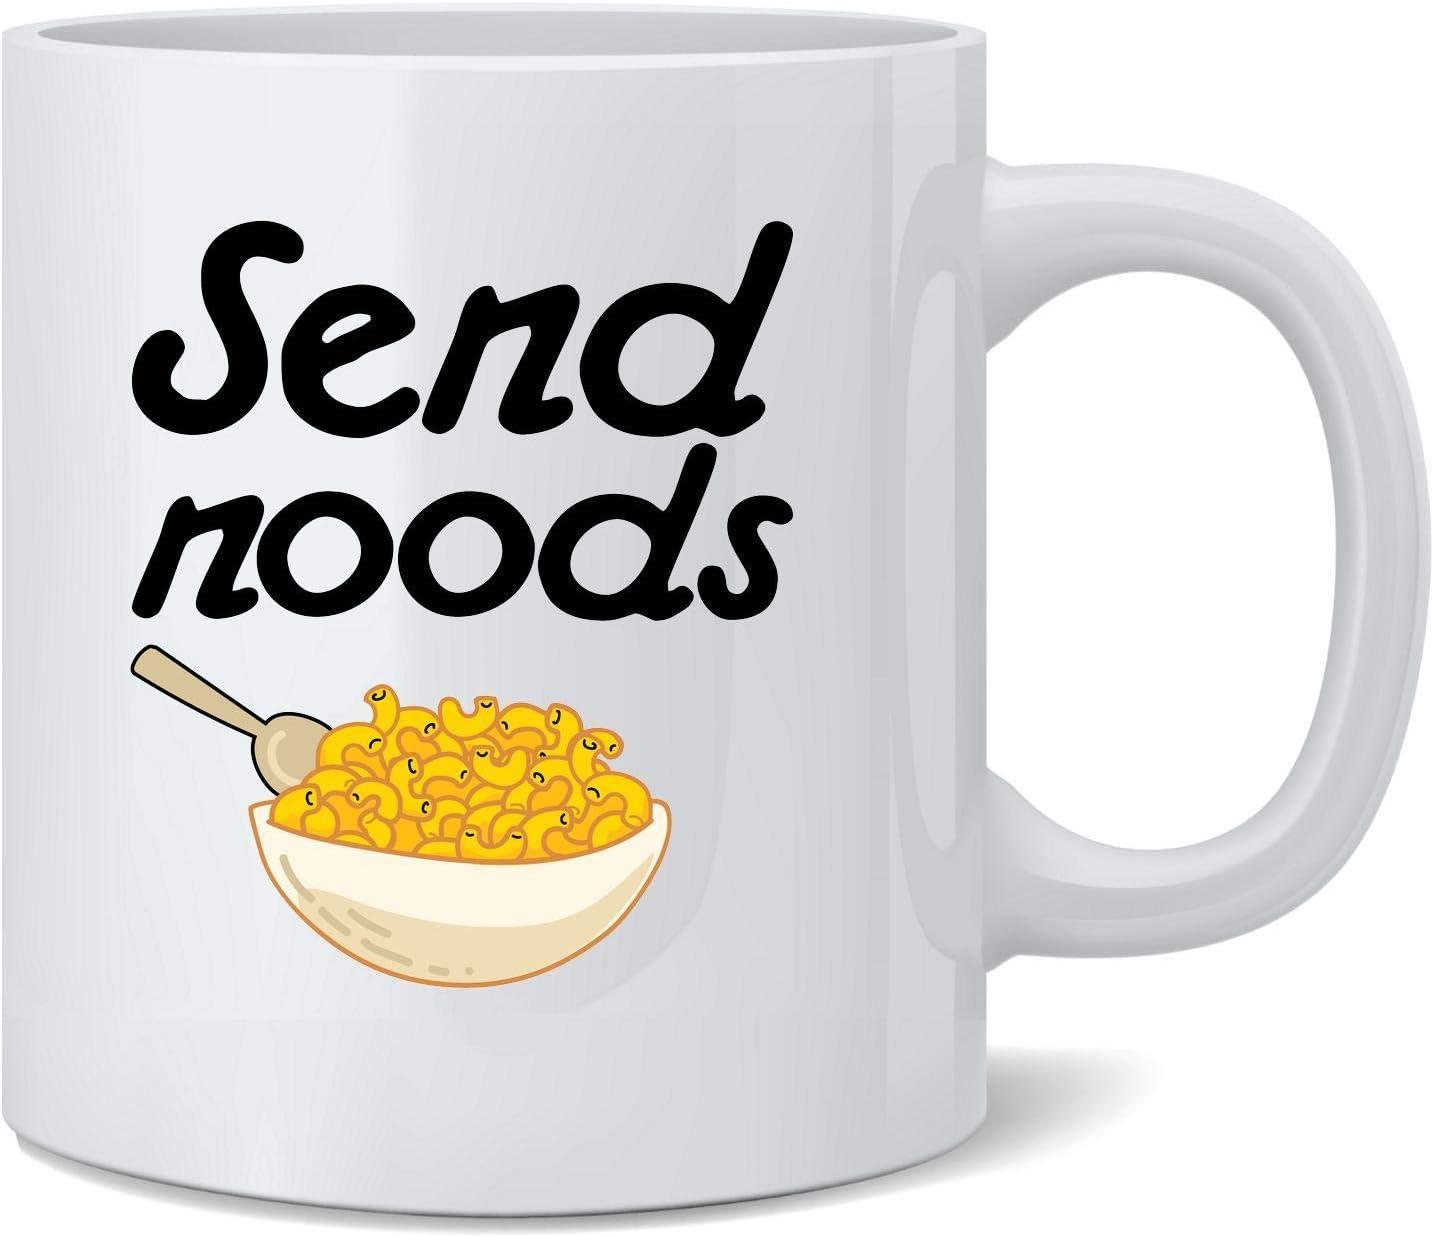 Poster Foundry Send Noods Food Pun Noodles Pun Ceramic Coffee Mug Tea Cup Fun Novelty Gift 12 oz